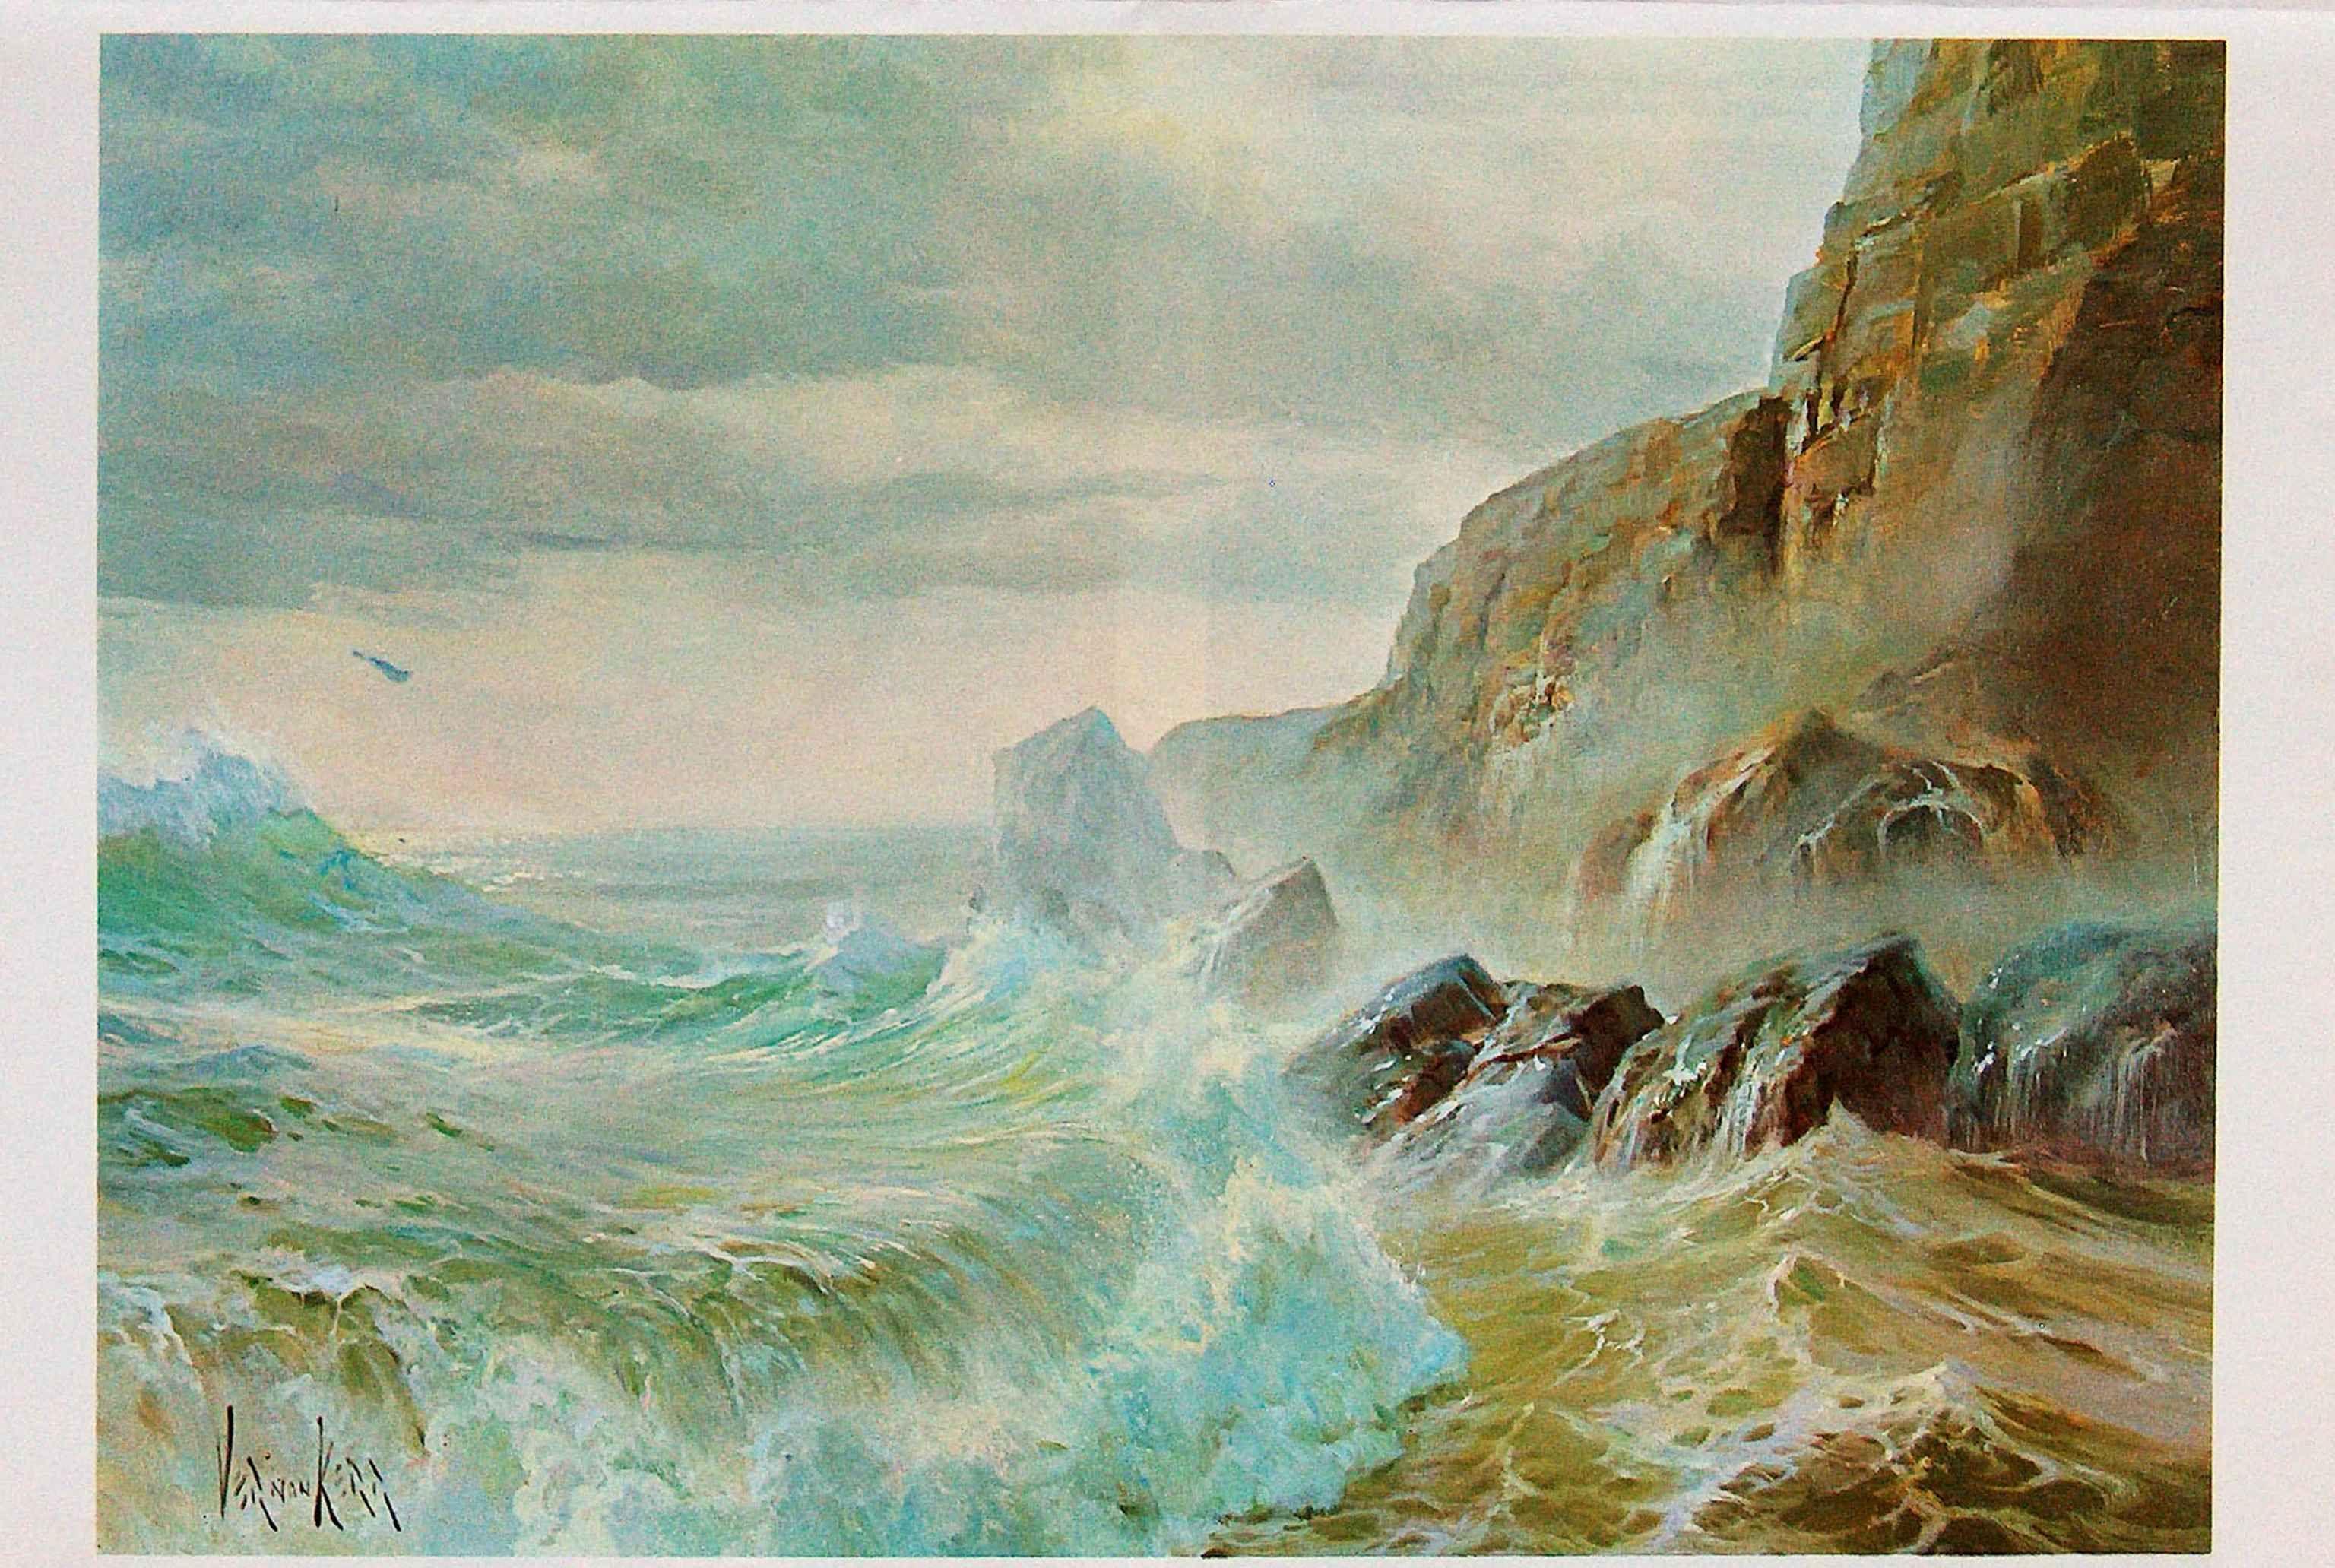 Boat In The Deep Sea Wallpaper In 2020 Art Painting Fantasy